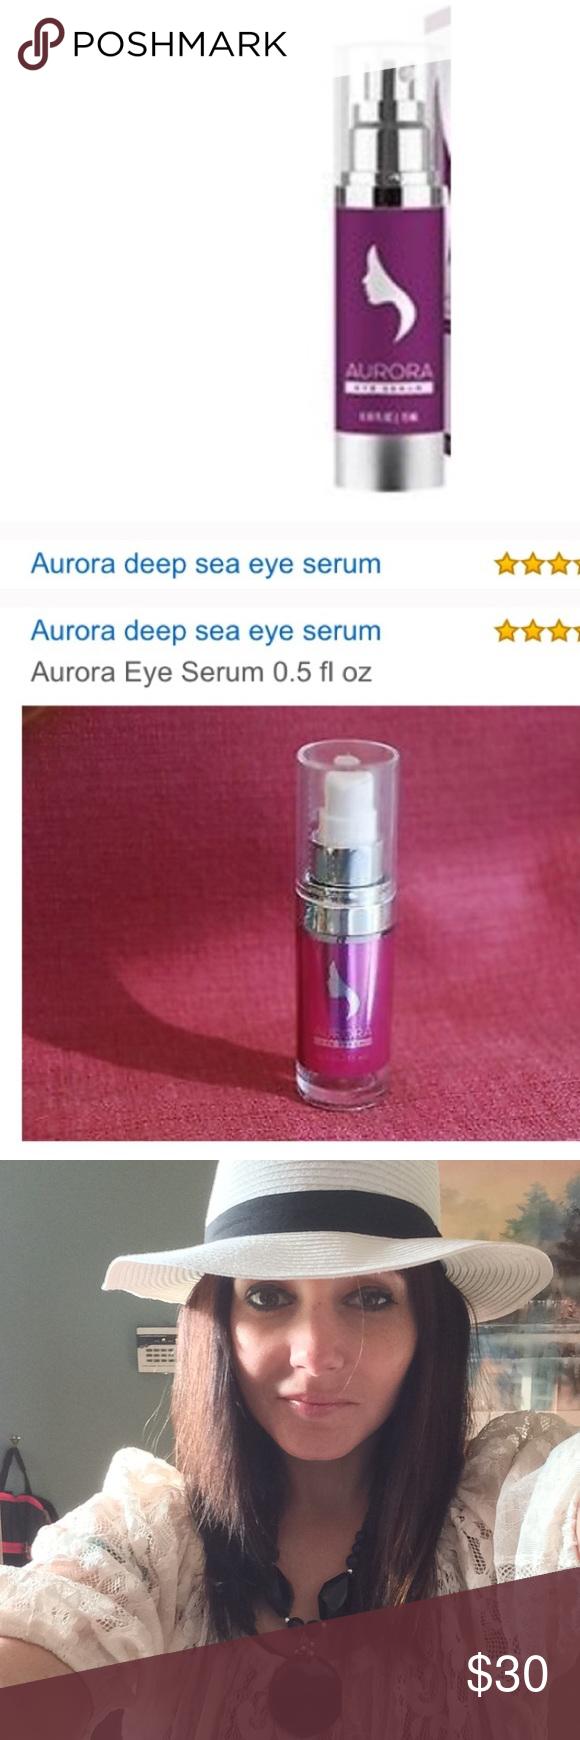 Aurora Mineral Anti Aging Eye Serum 0 5 Oz Erase Time This Magical Formula Works Wonders